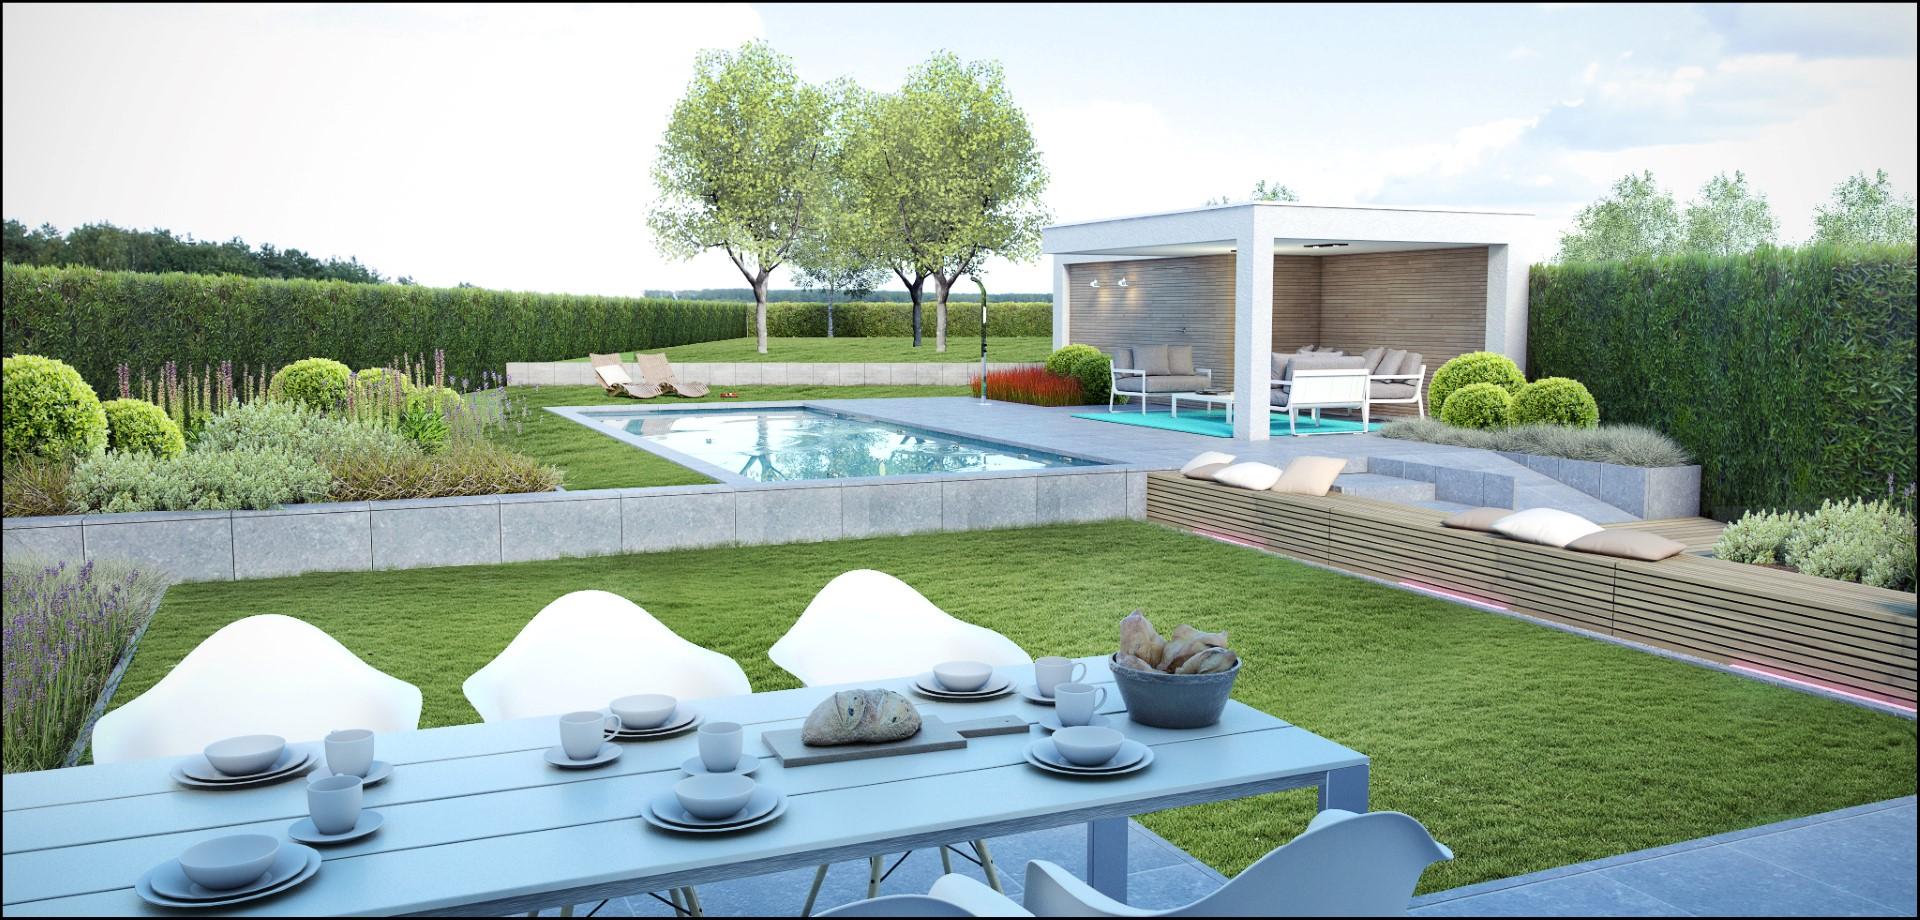 Eco tuinarchitectengroep 3d projecten zwembad poolhouse for Zwembad desing